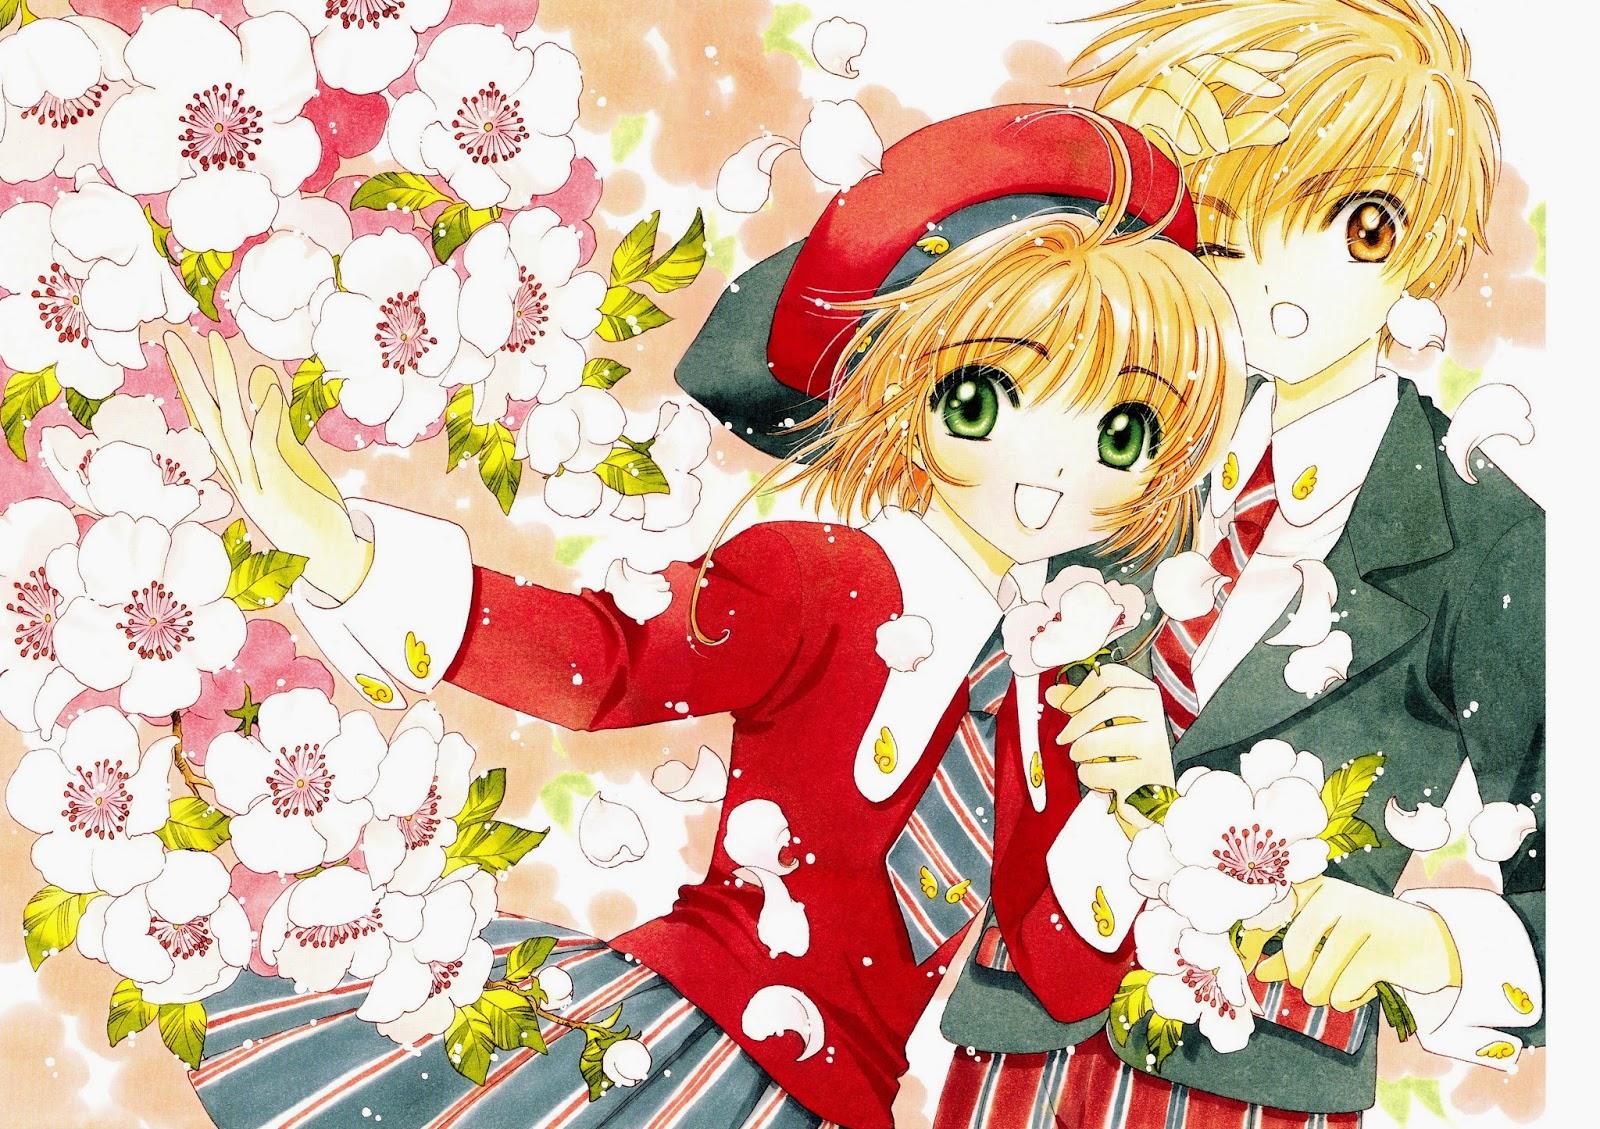 House of wallpapers free download high definition - Cardcaptor sakura wallpaper ...